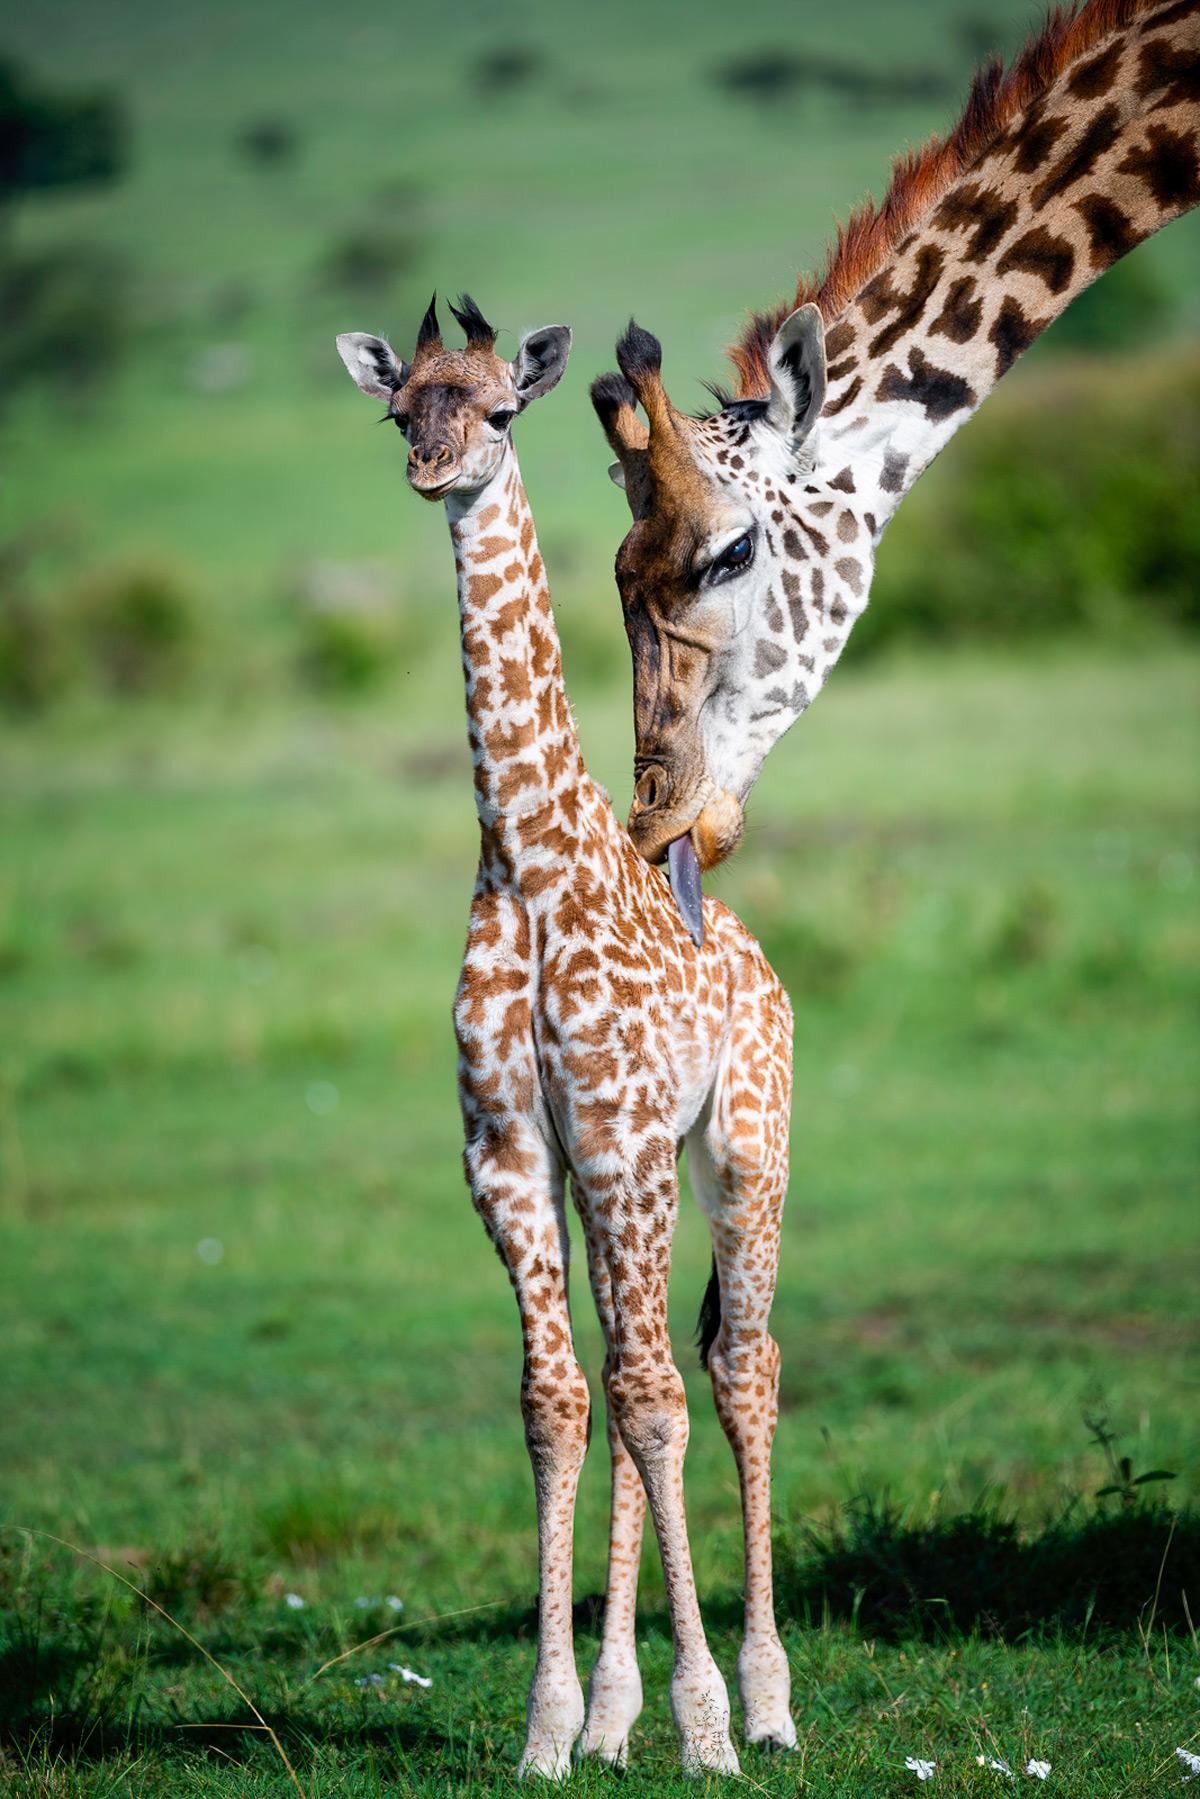 A giraffe grooms her calf in Mara North Conservancy, Kenya © Yaron Schmid